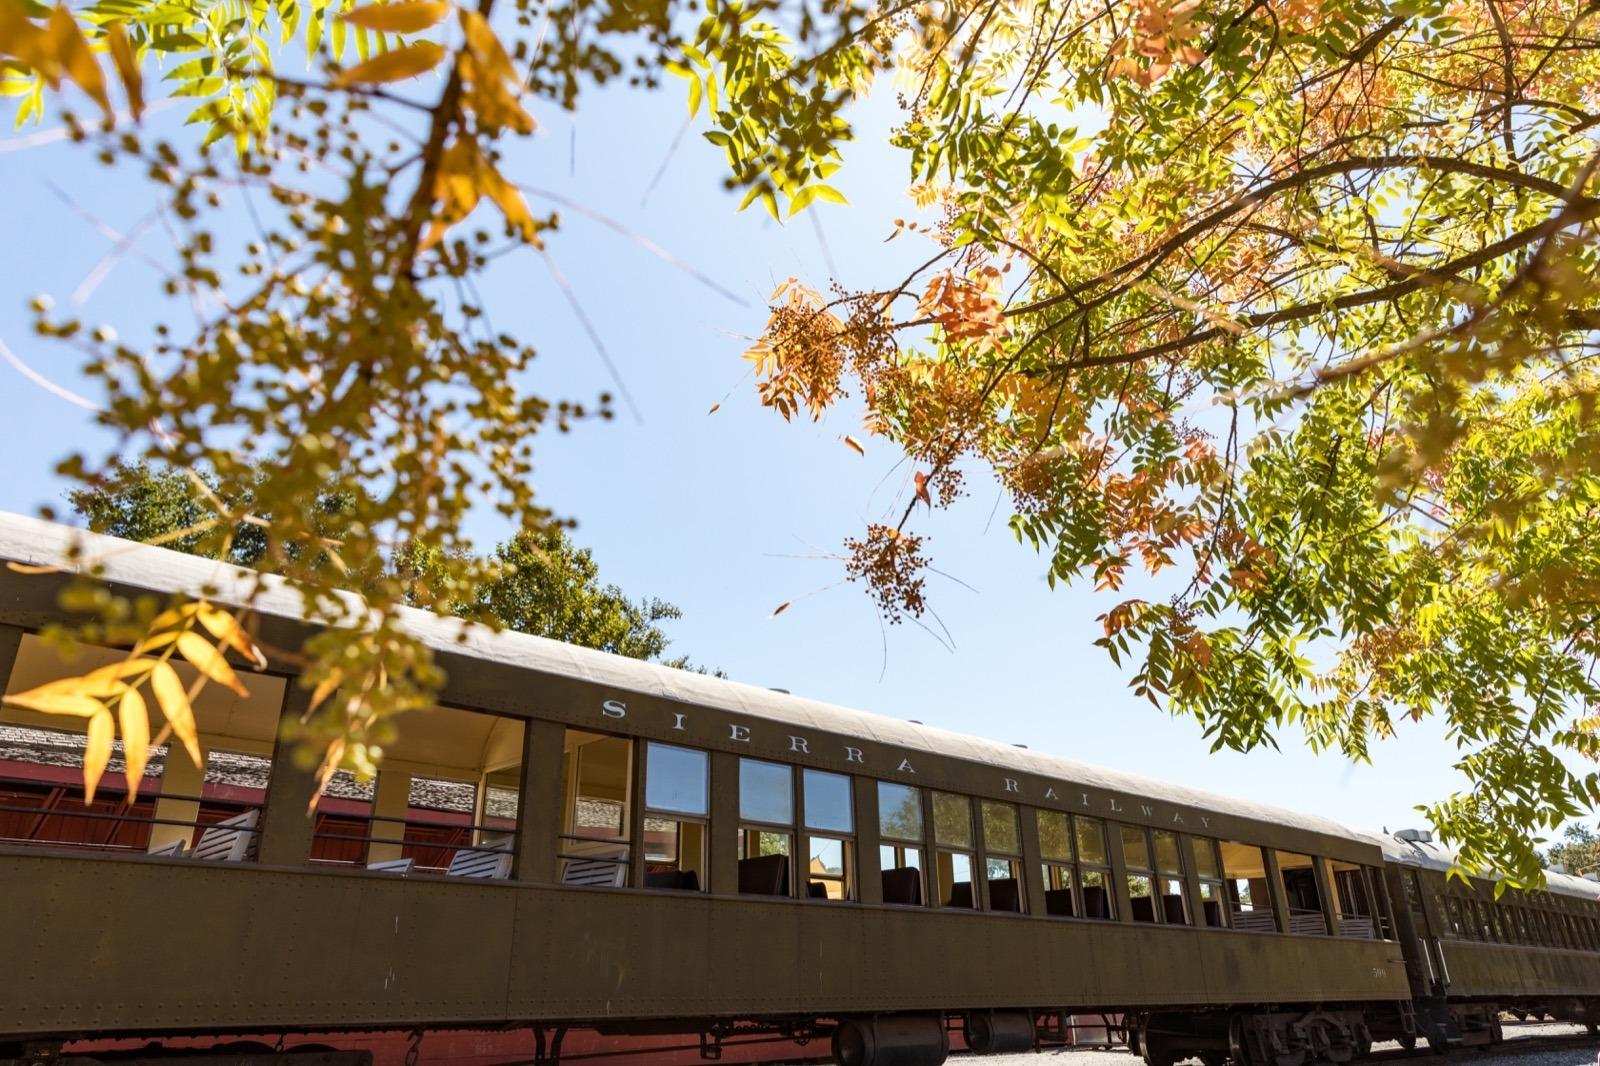 california-high-sierra-tuolumne-county-jamestown-railtown-1